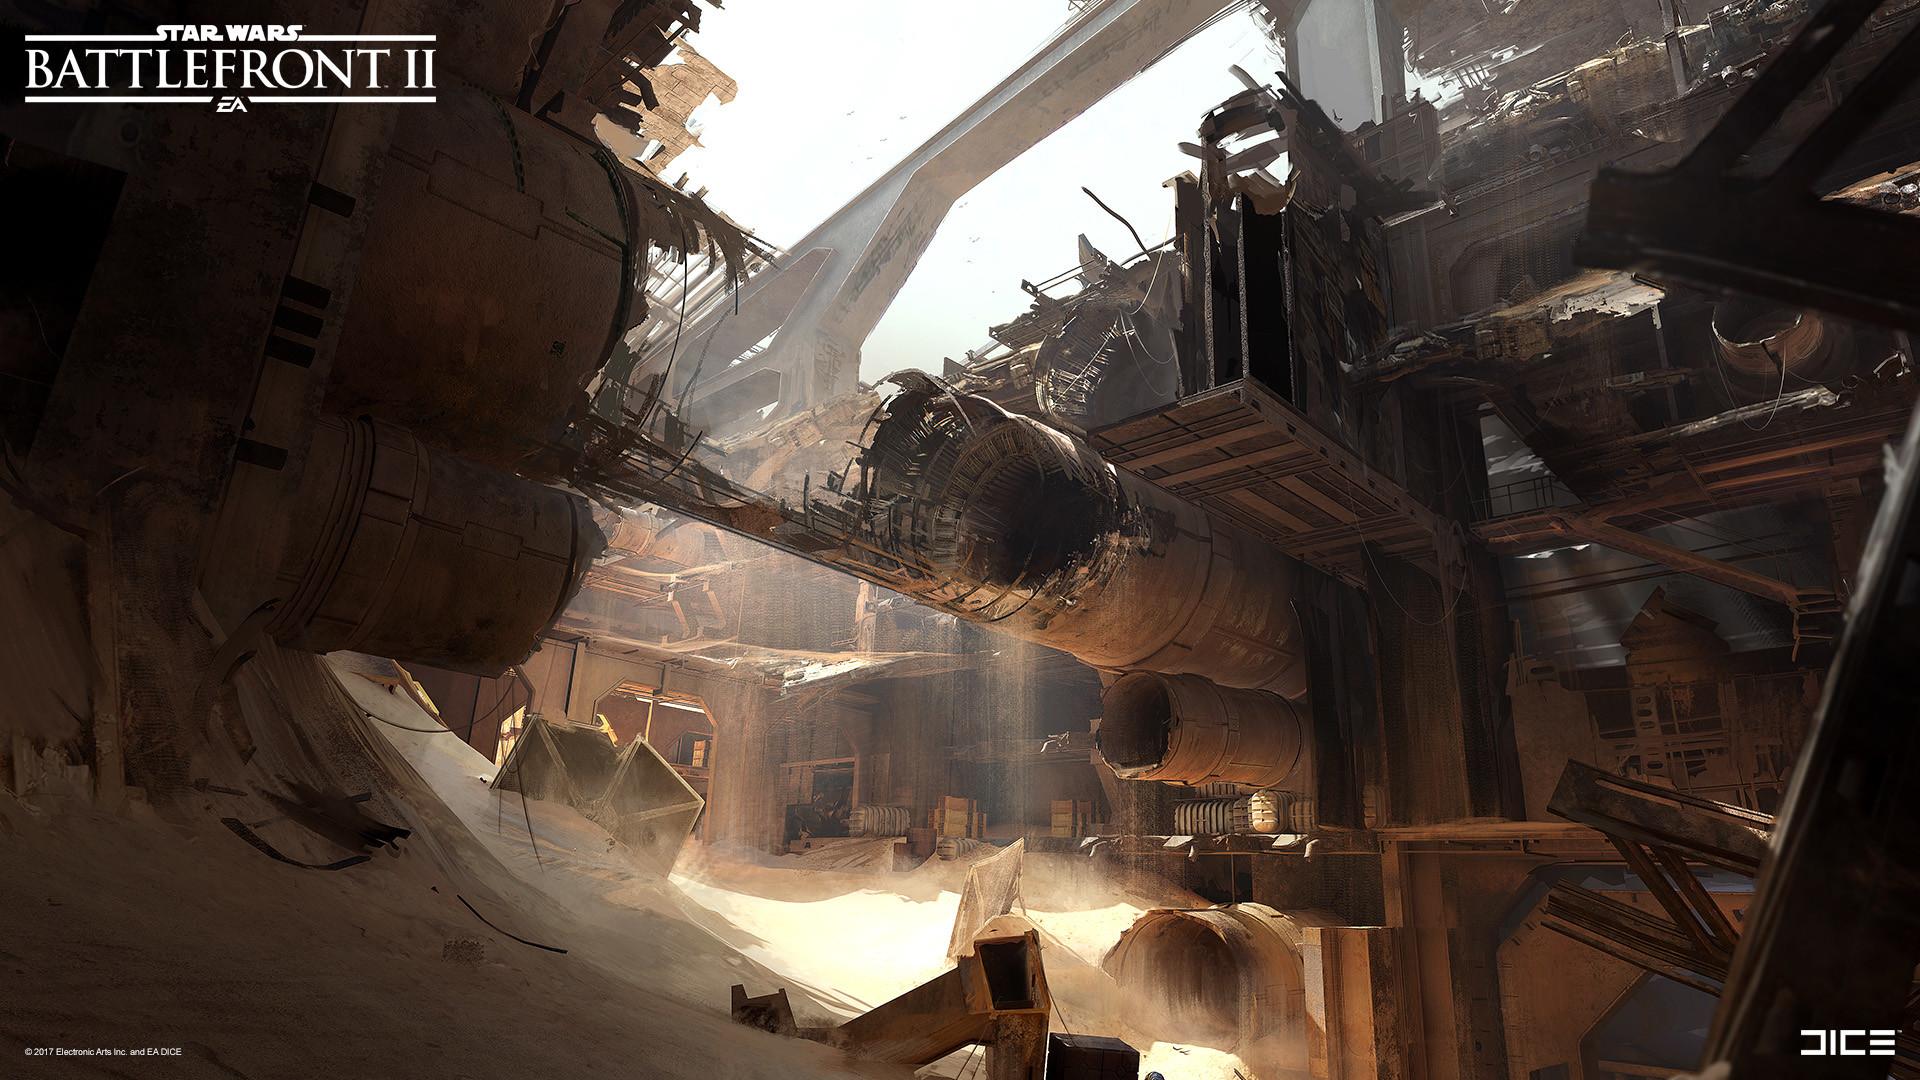 Artstation Star Wars Battlefront Ii Concept Art Jakku Esbjorn Nord